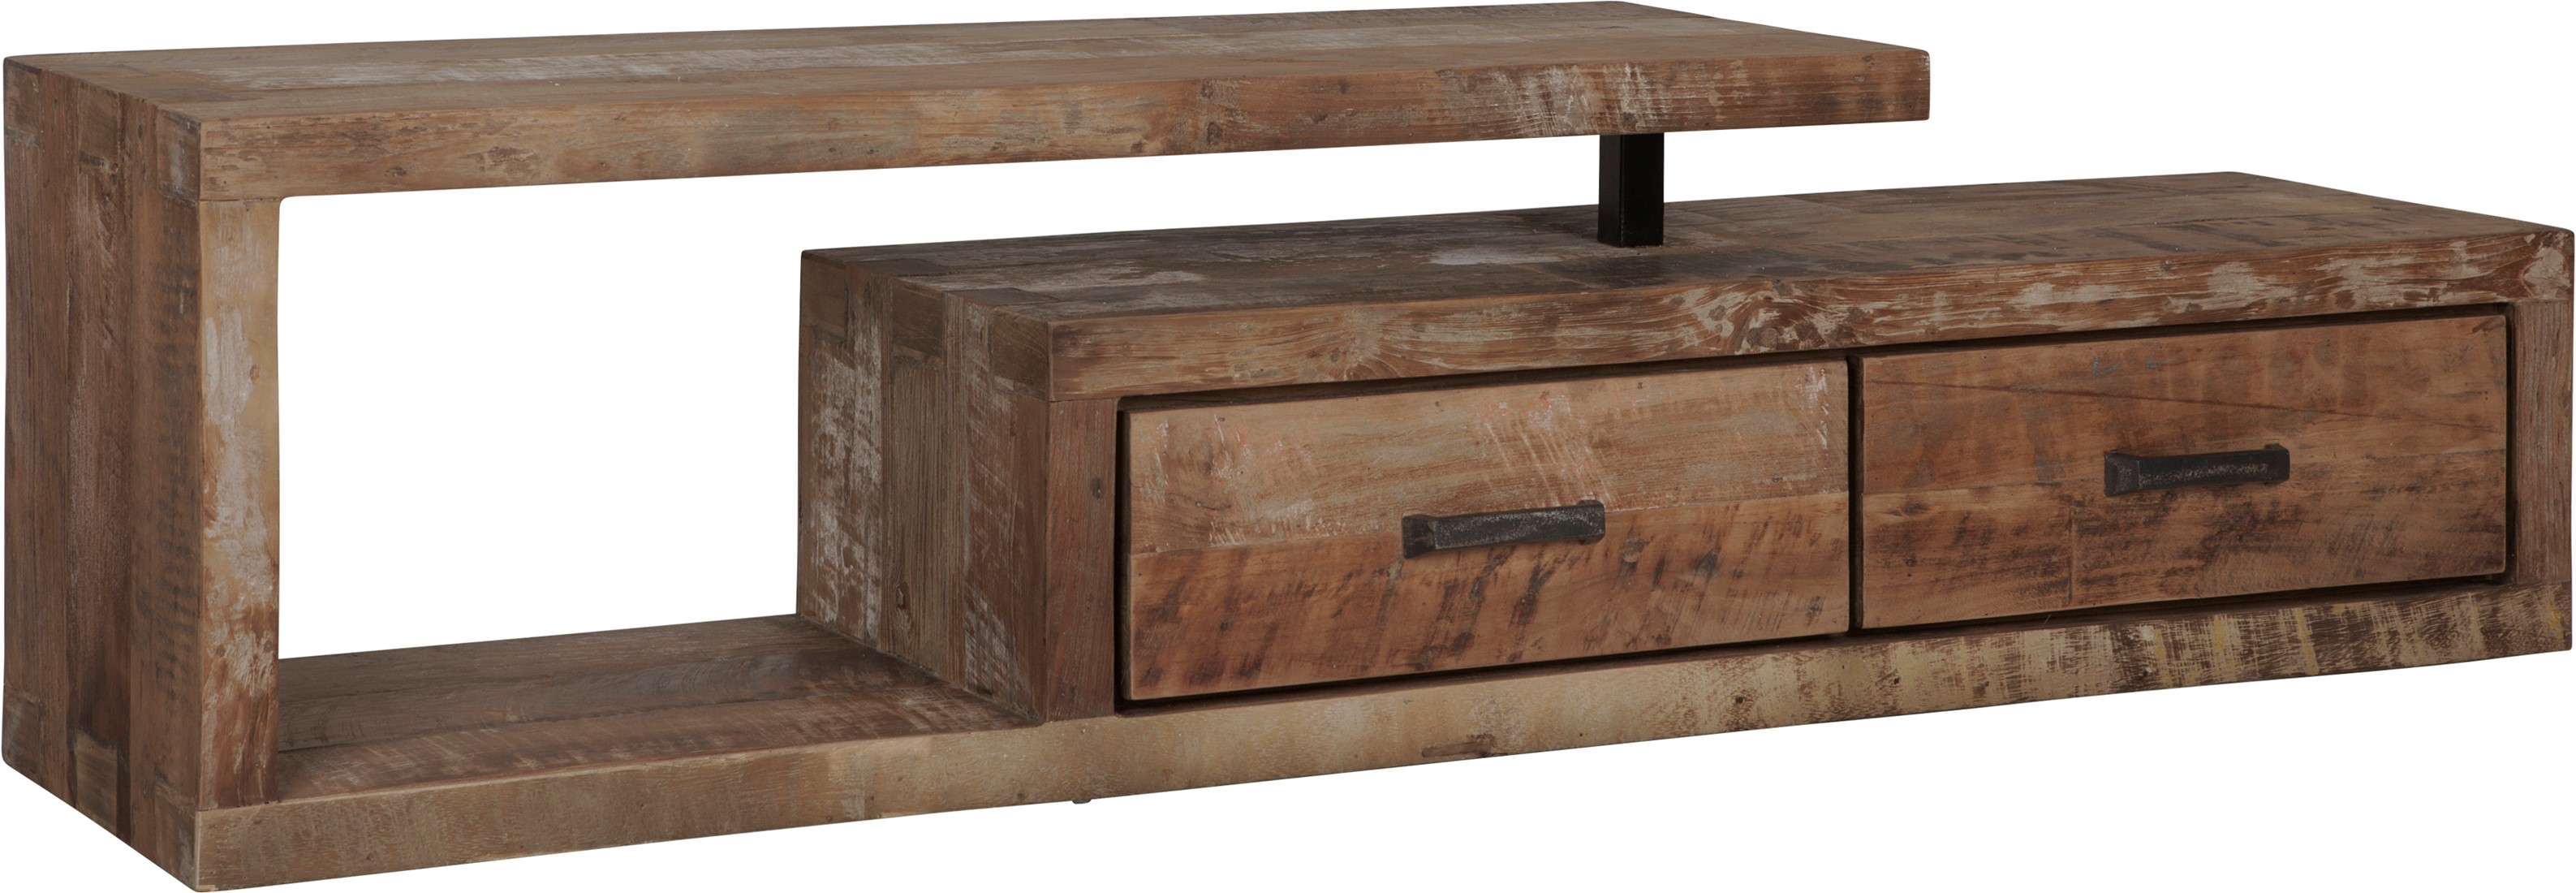 Tv Meubel Plank.D Bodhi Tv Meubel Soul 175 Cm